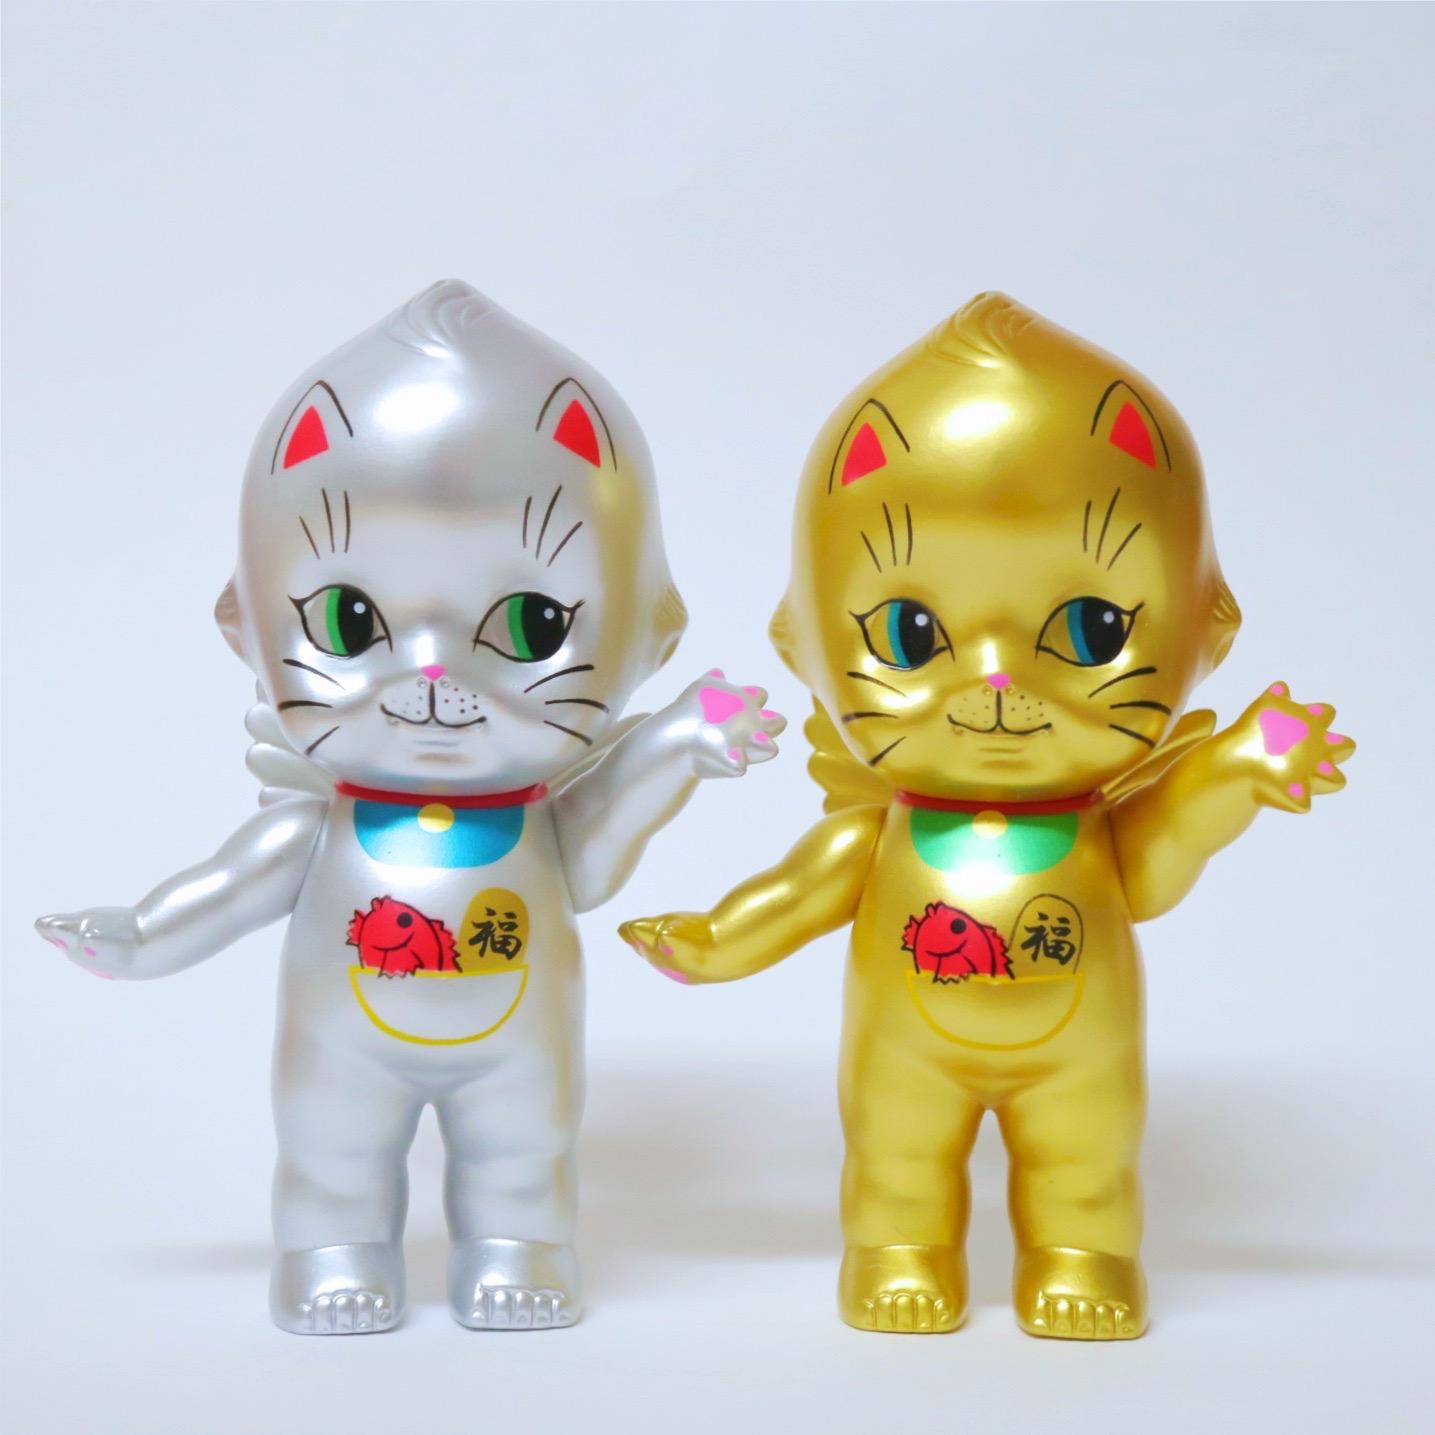 obitsu kewpie refreshment toy